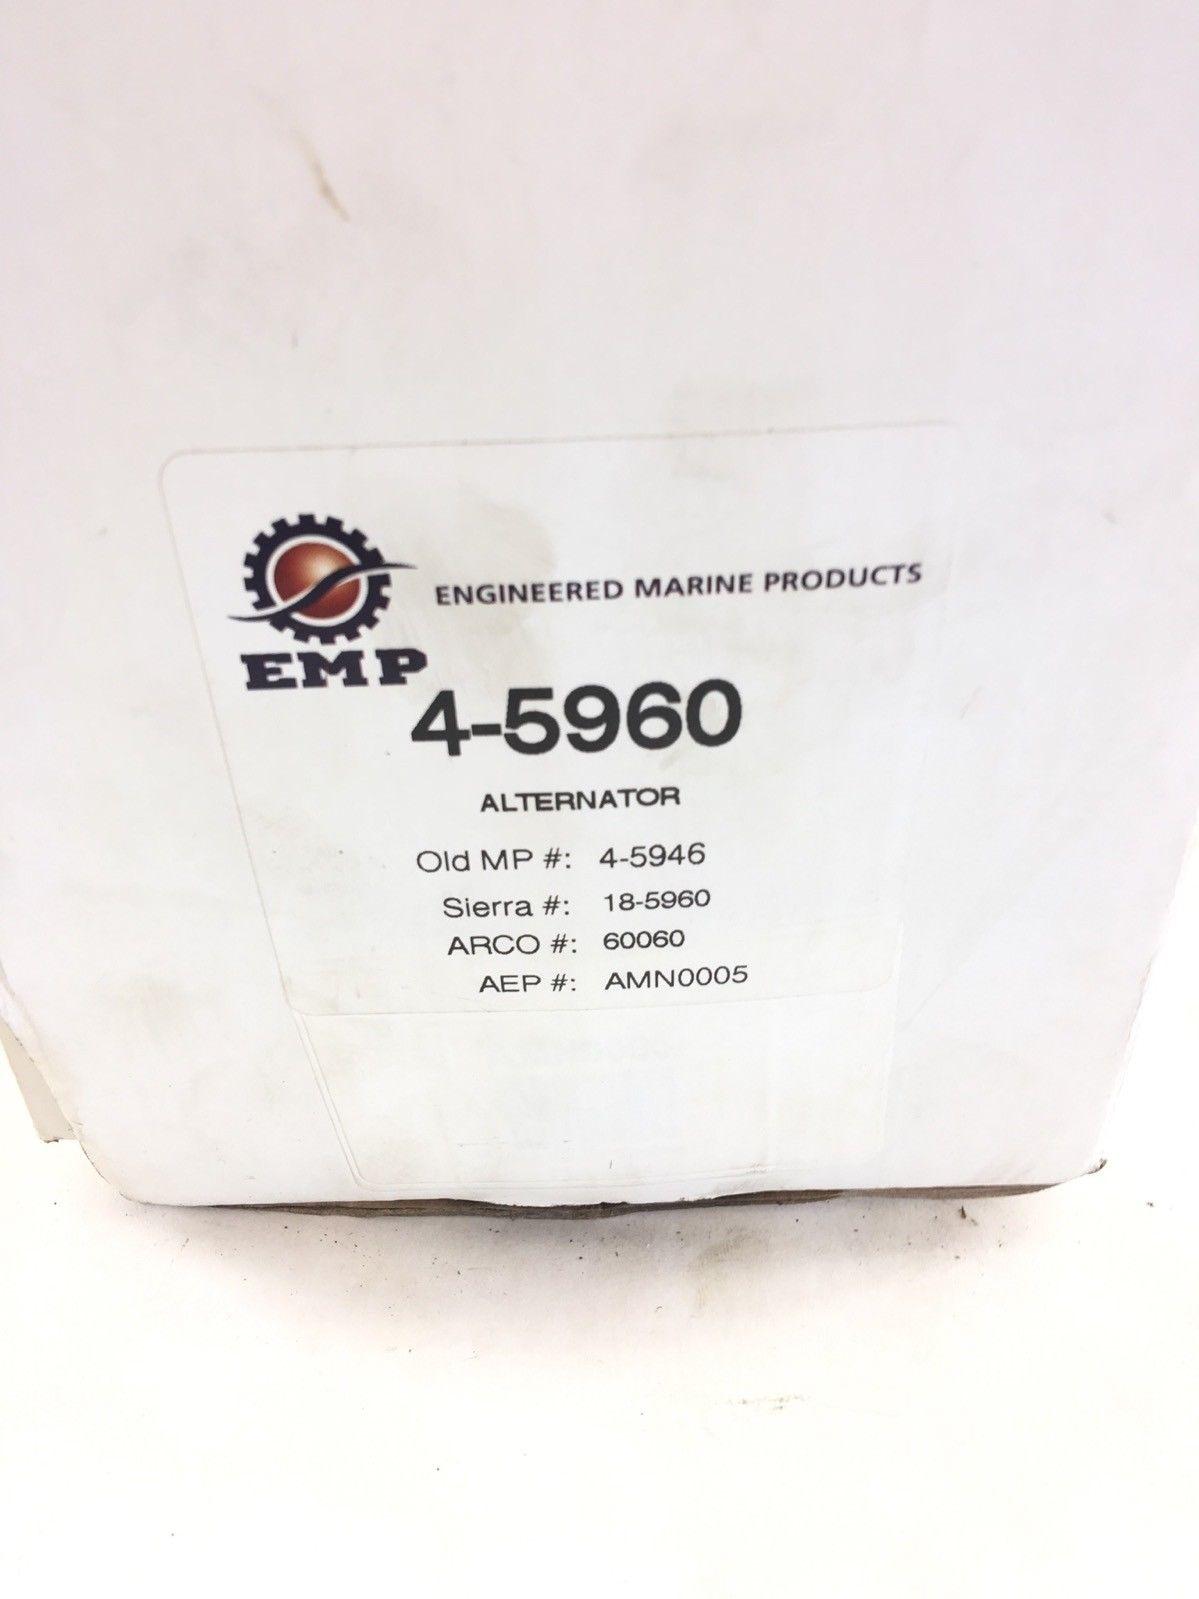 NEW IN BOX EMP ALTERNATOR 4-5960 AMN0005 18-5960 60060 4-5946 MERCRUISER, (B398) 2